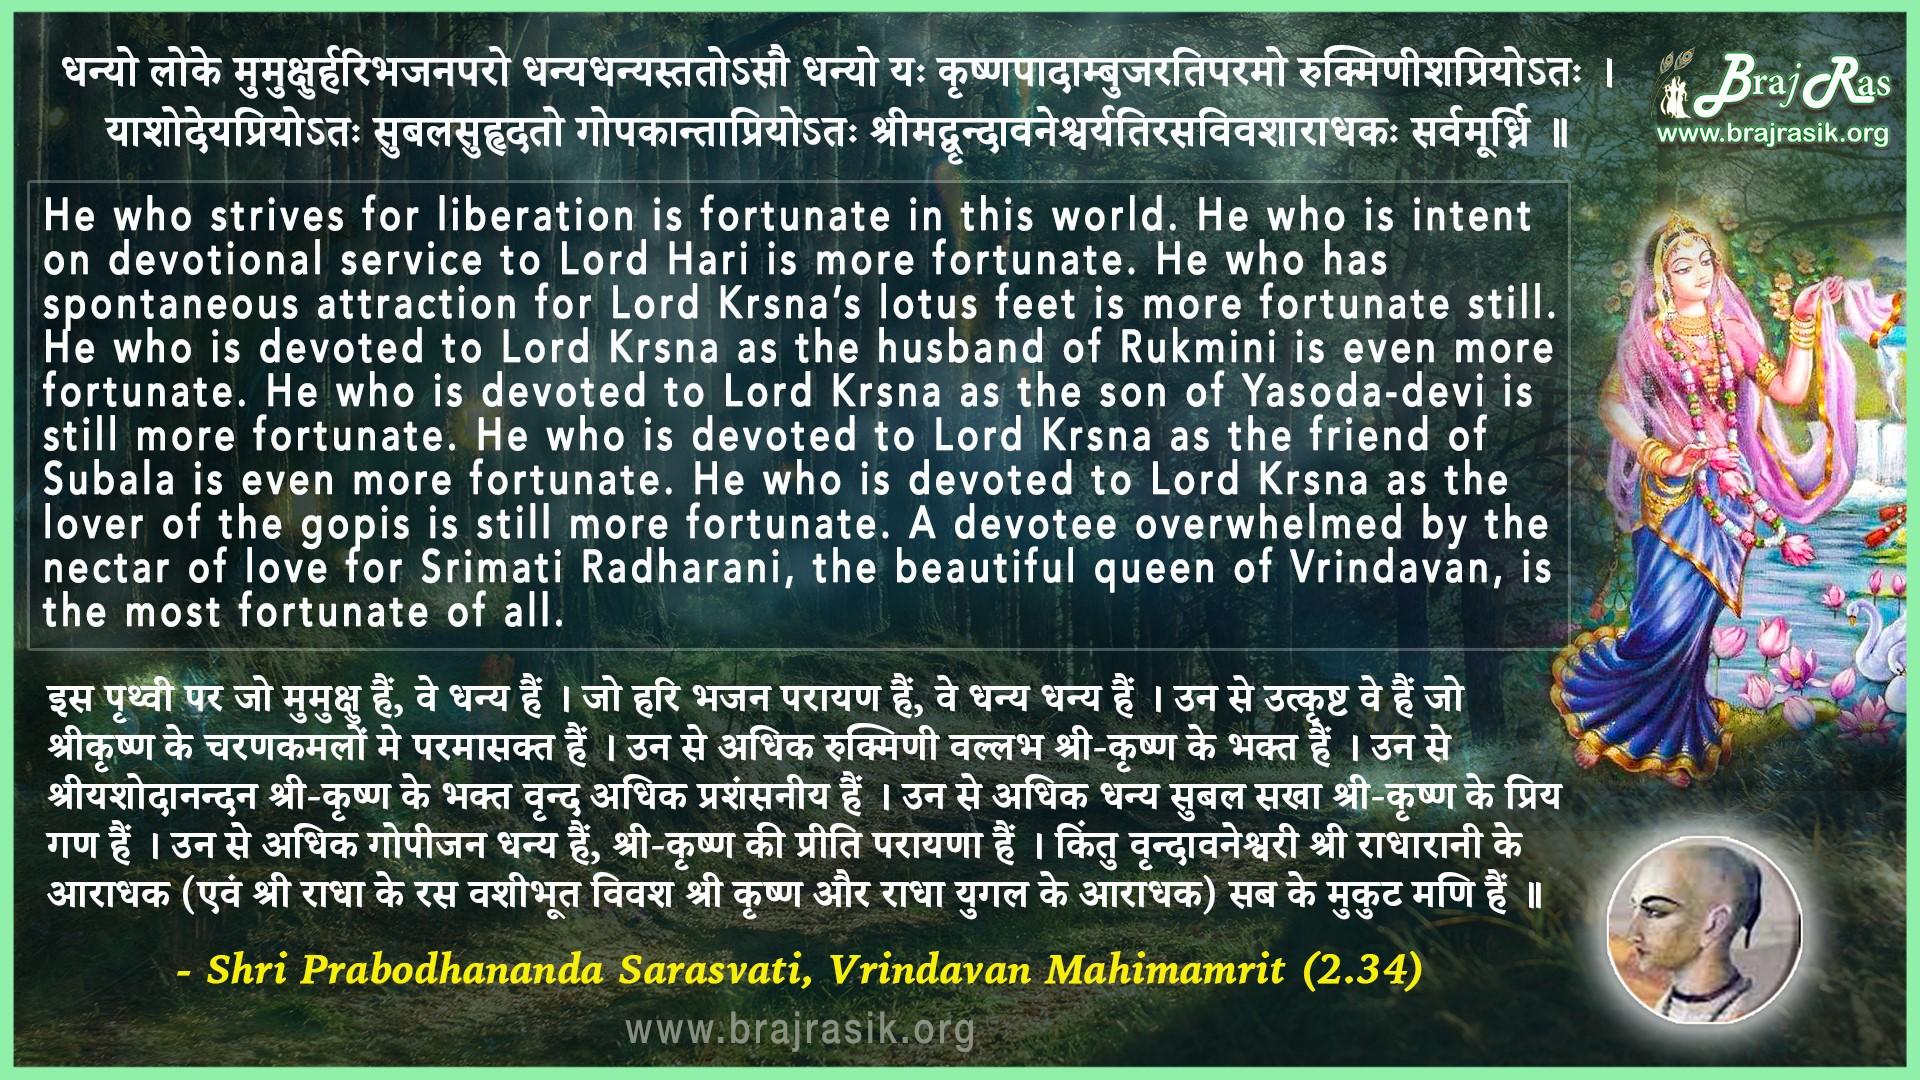 Dhanyo Loke Mumukshurharibhajanparo - Shri Prabodhananda Sarasvati, Vrindavan Mahimamrit (2.34)